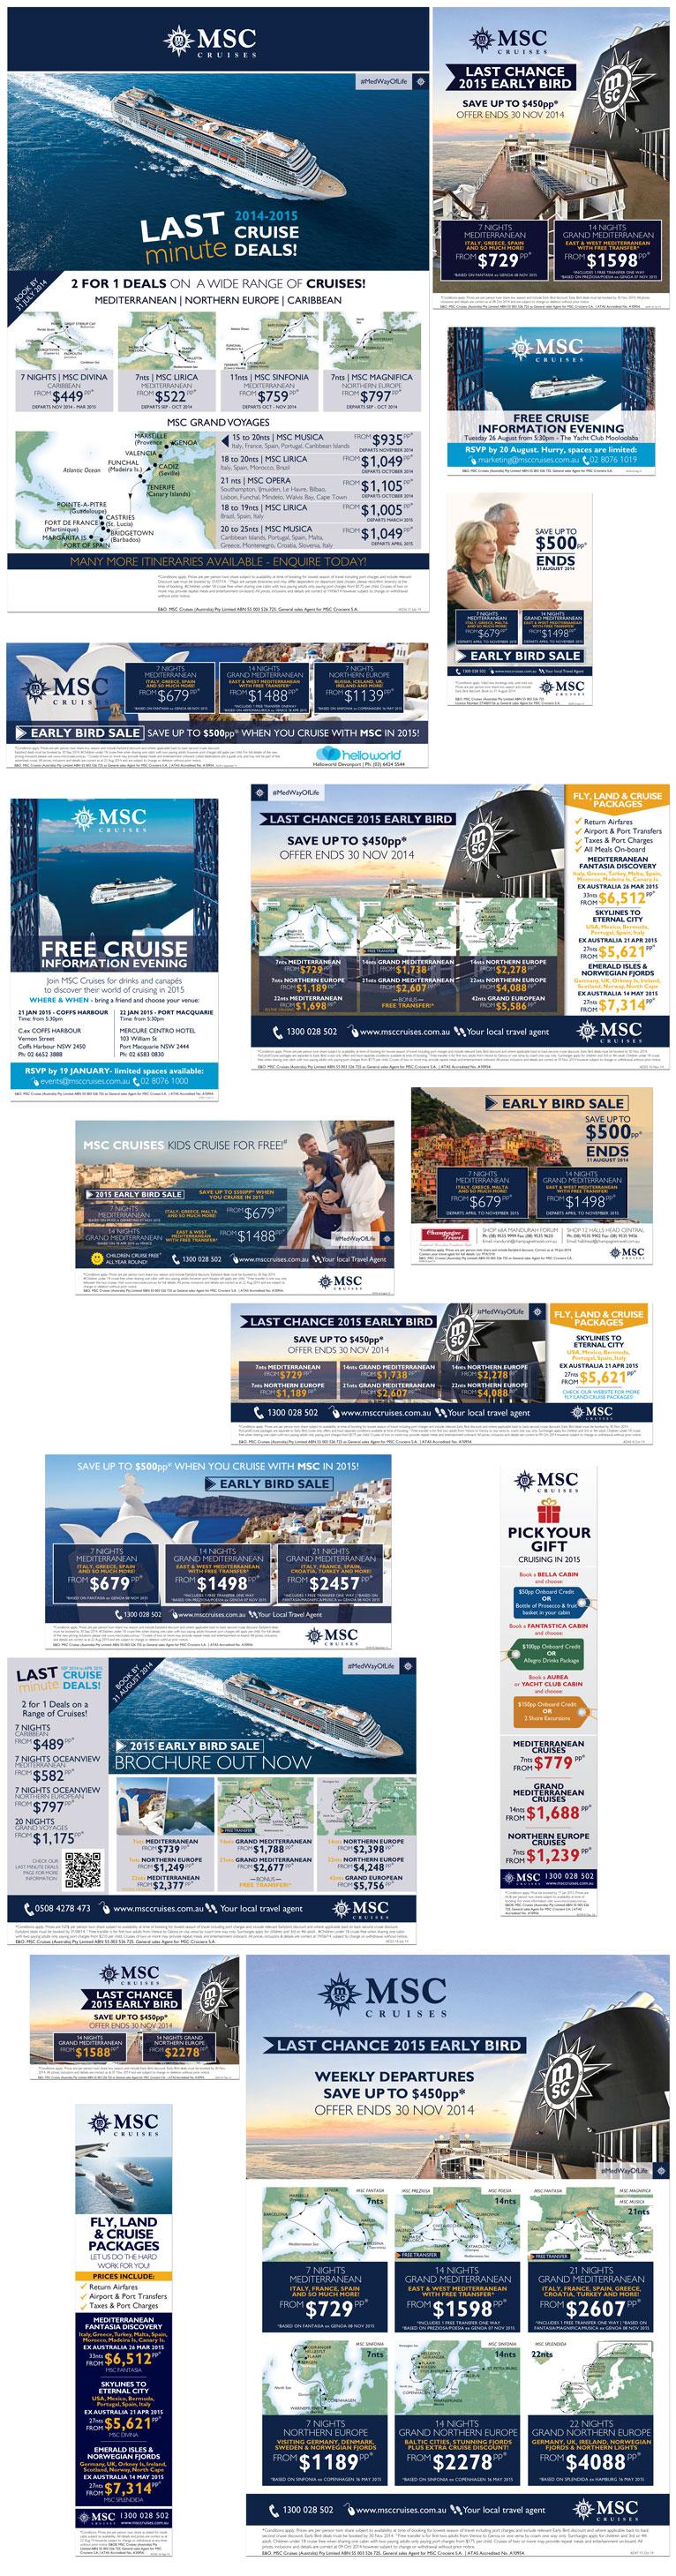 msc-print-ads